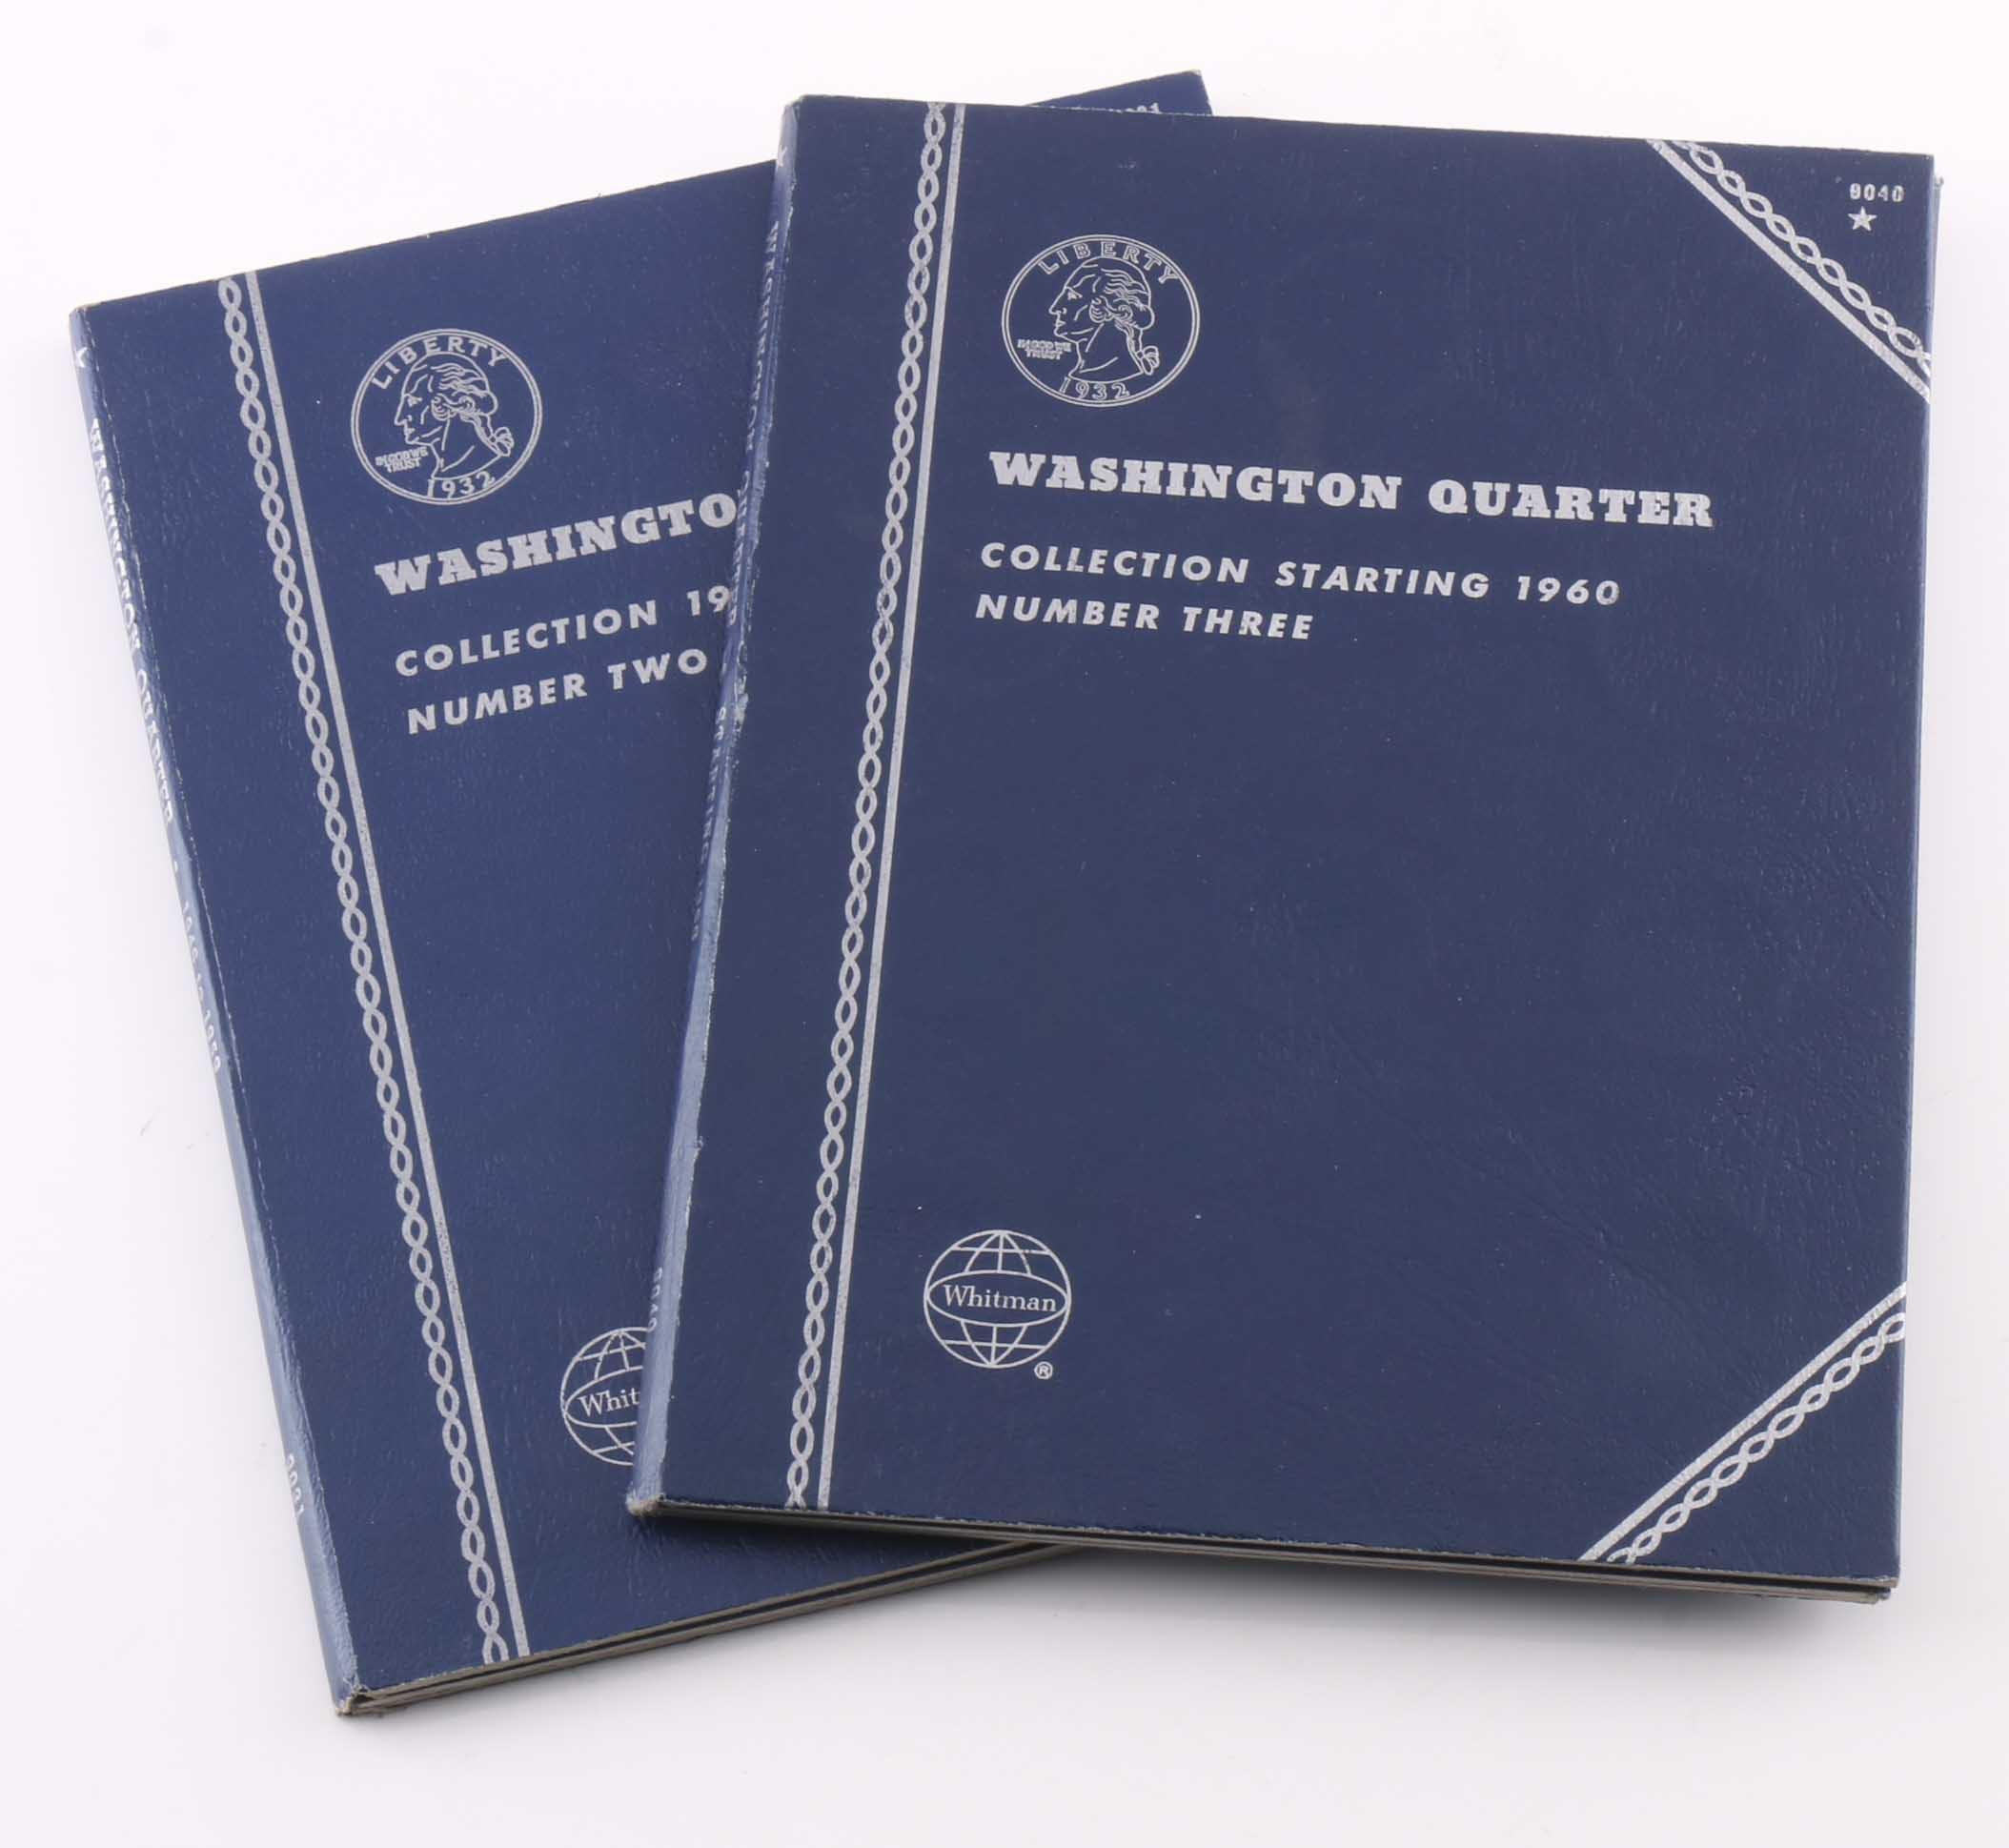 Two Whitman Binders of Washington Quarters